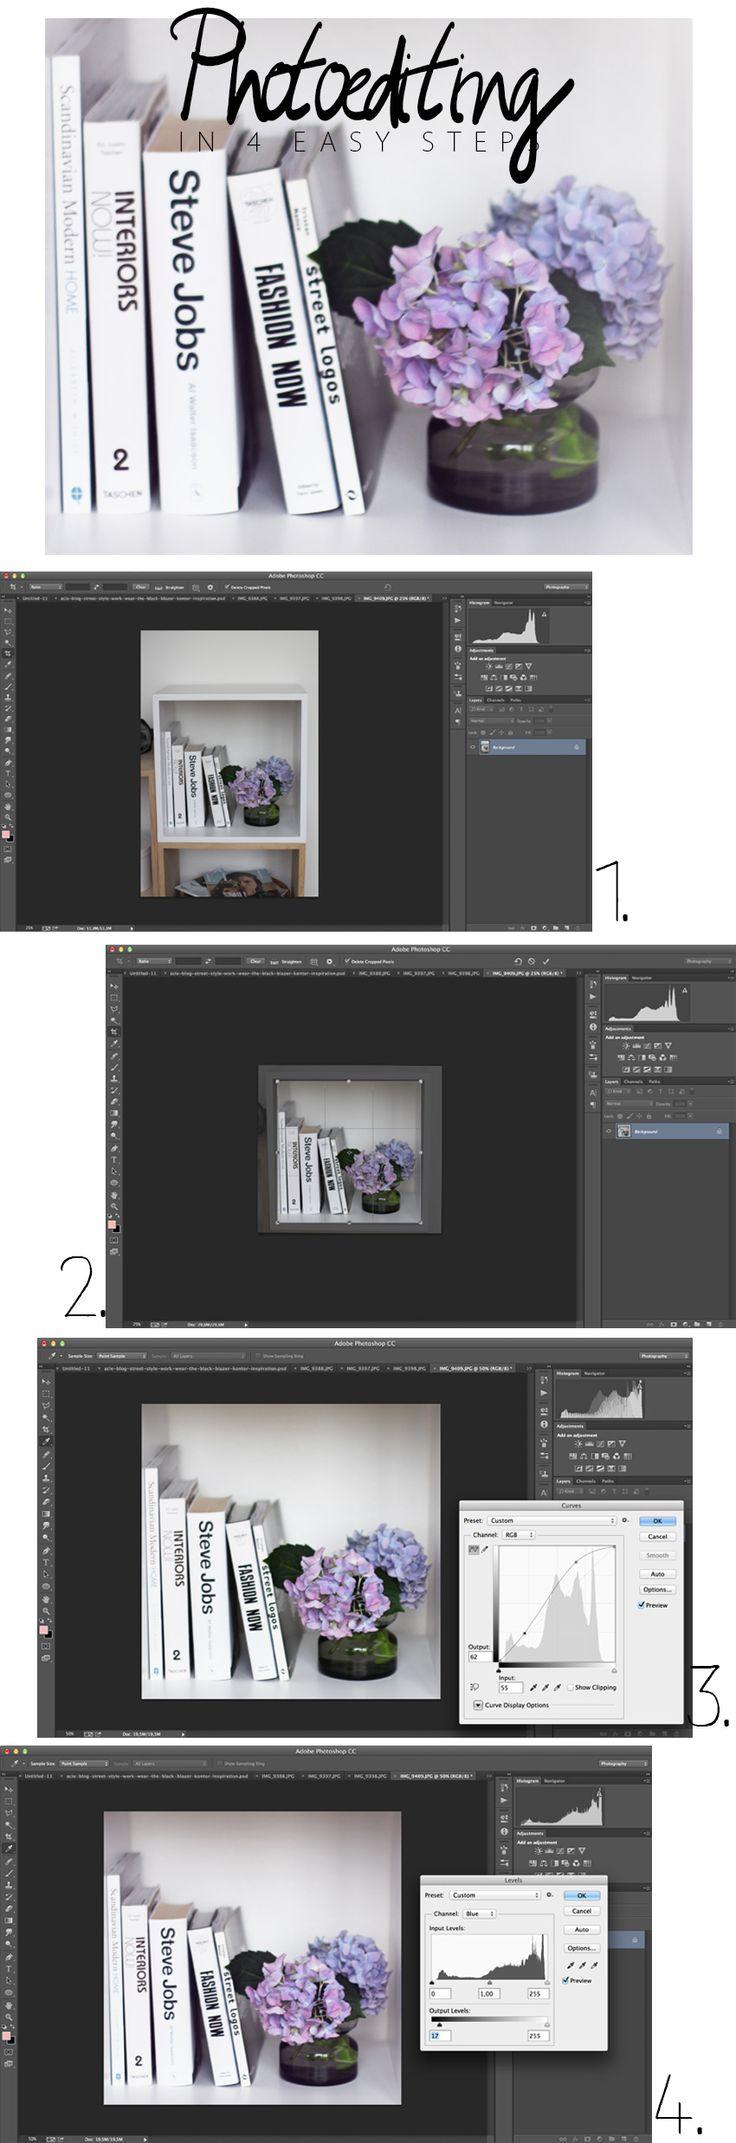 how-to-edit-your-photos-in-4-easy-steps-billederedigering-blog-photoshop-tips-acie-blog